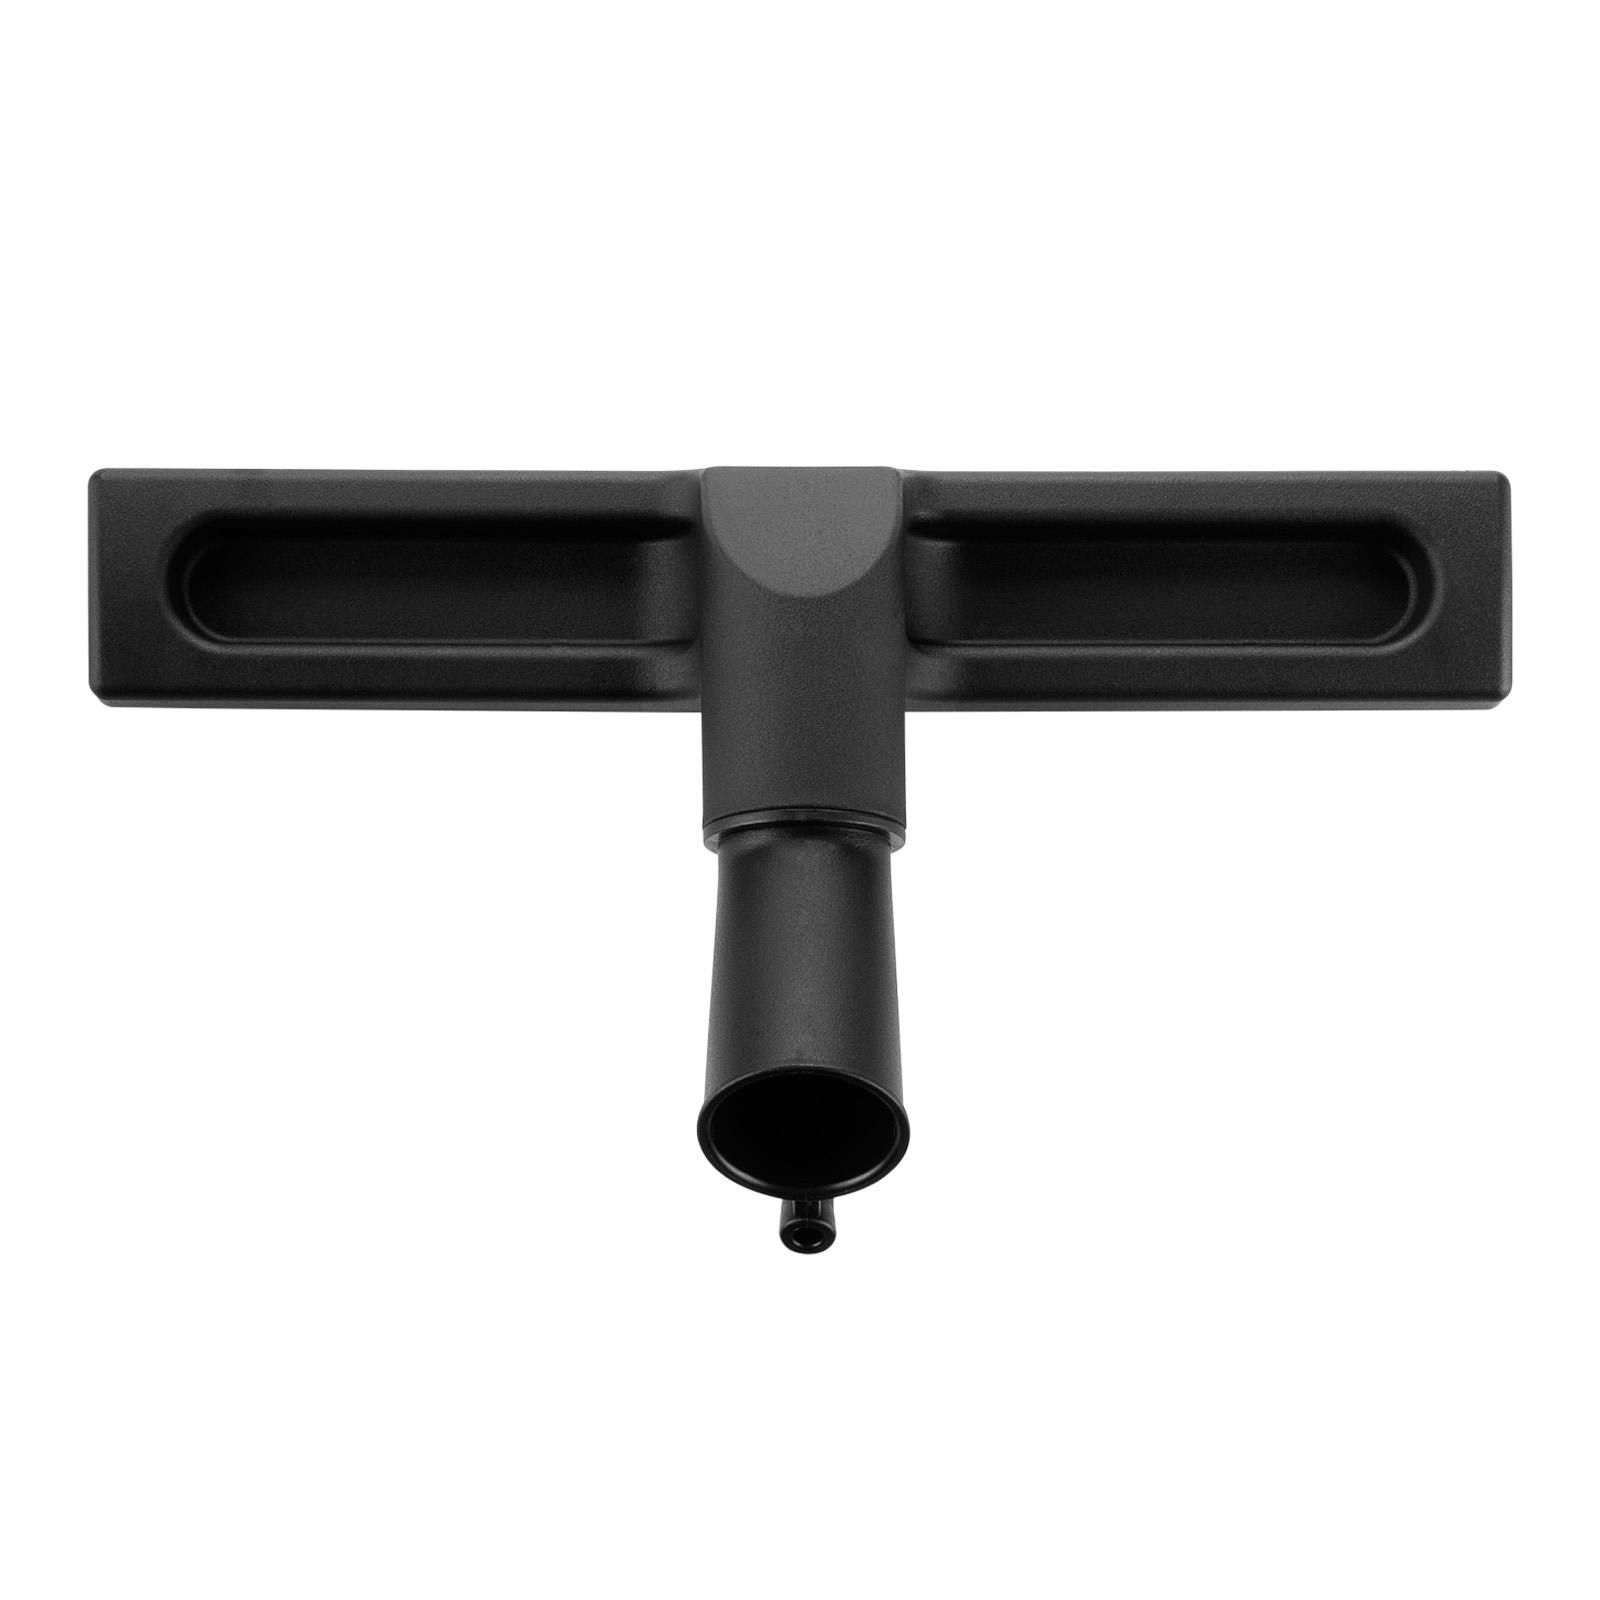 Vac Floor Tool - Top